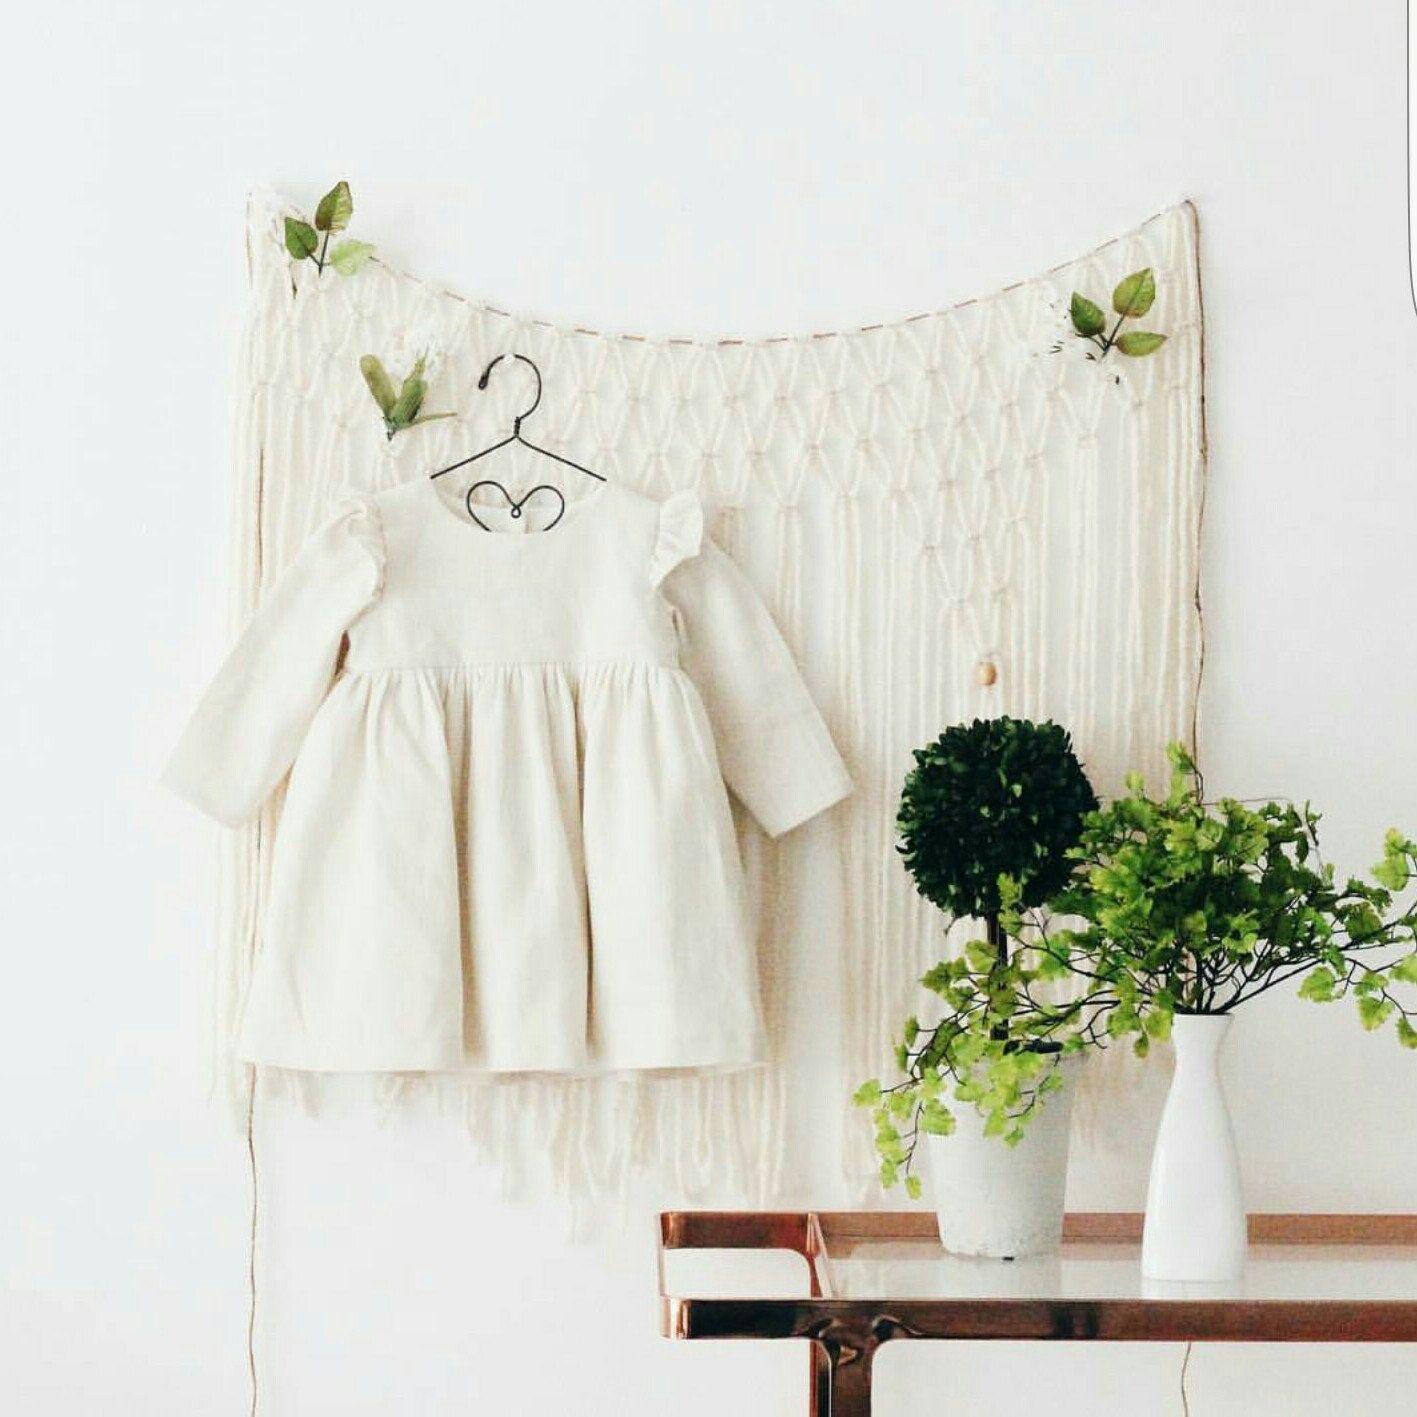 Ivory Modern Macrame Hanging for Boho Window Decor or Wall Art Baby